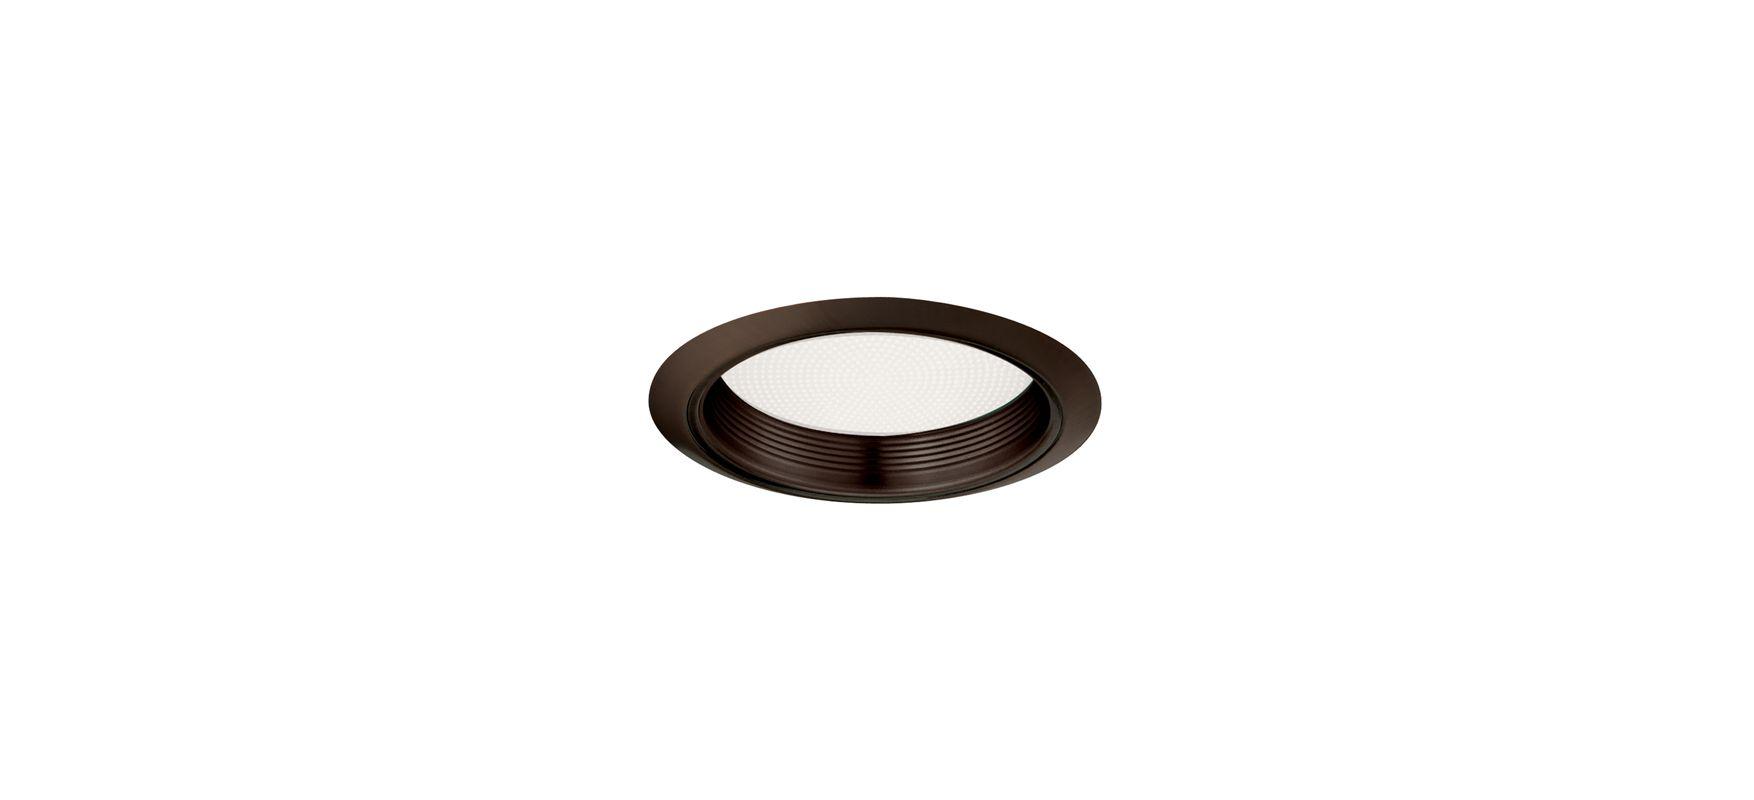 "Elco ELM42 6"" Baffle with Regressed Alabalite Lens Bronze Recessed"